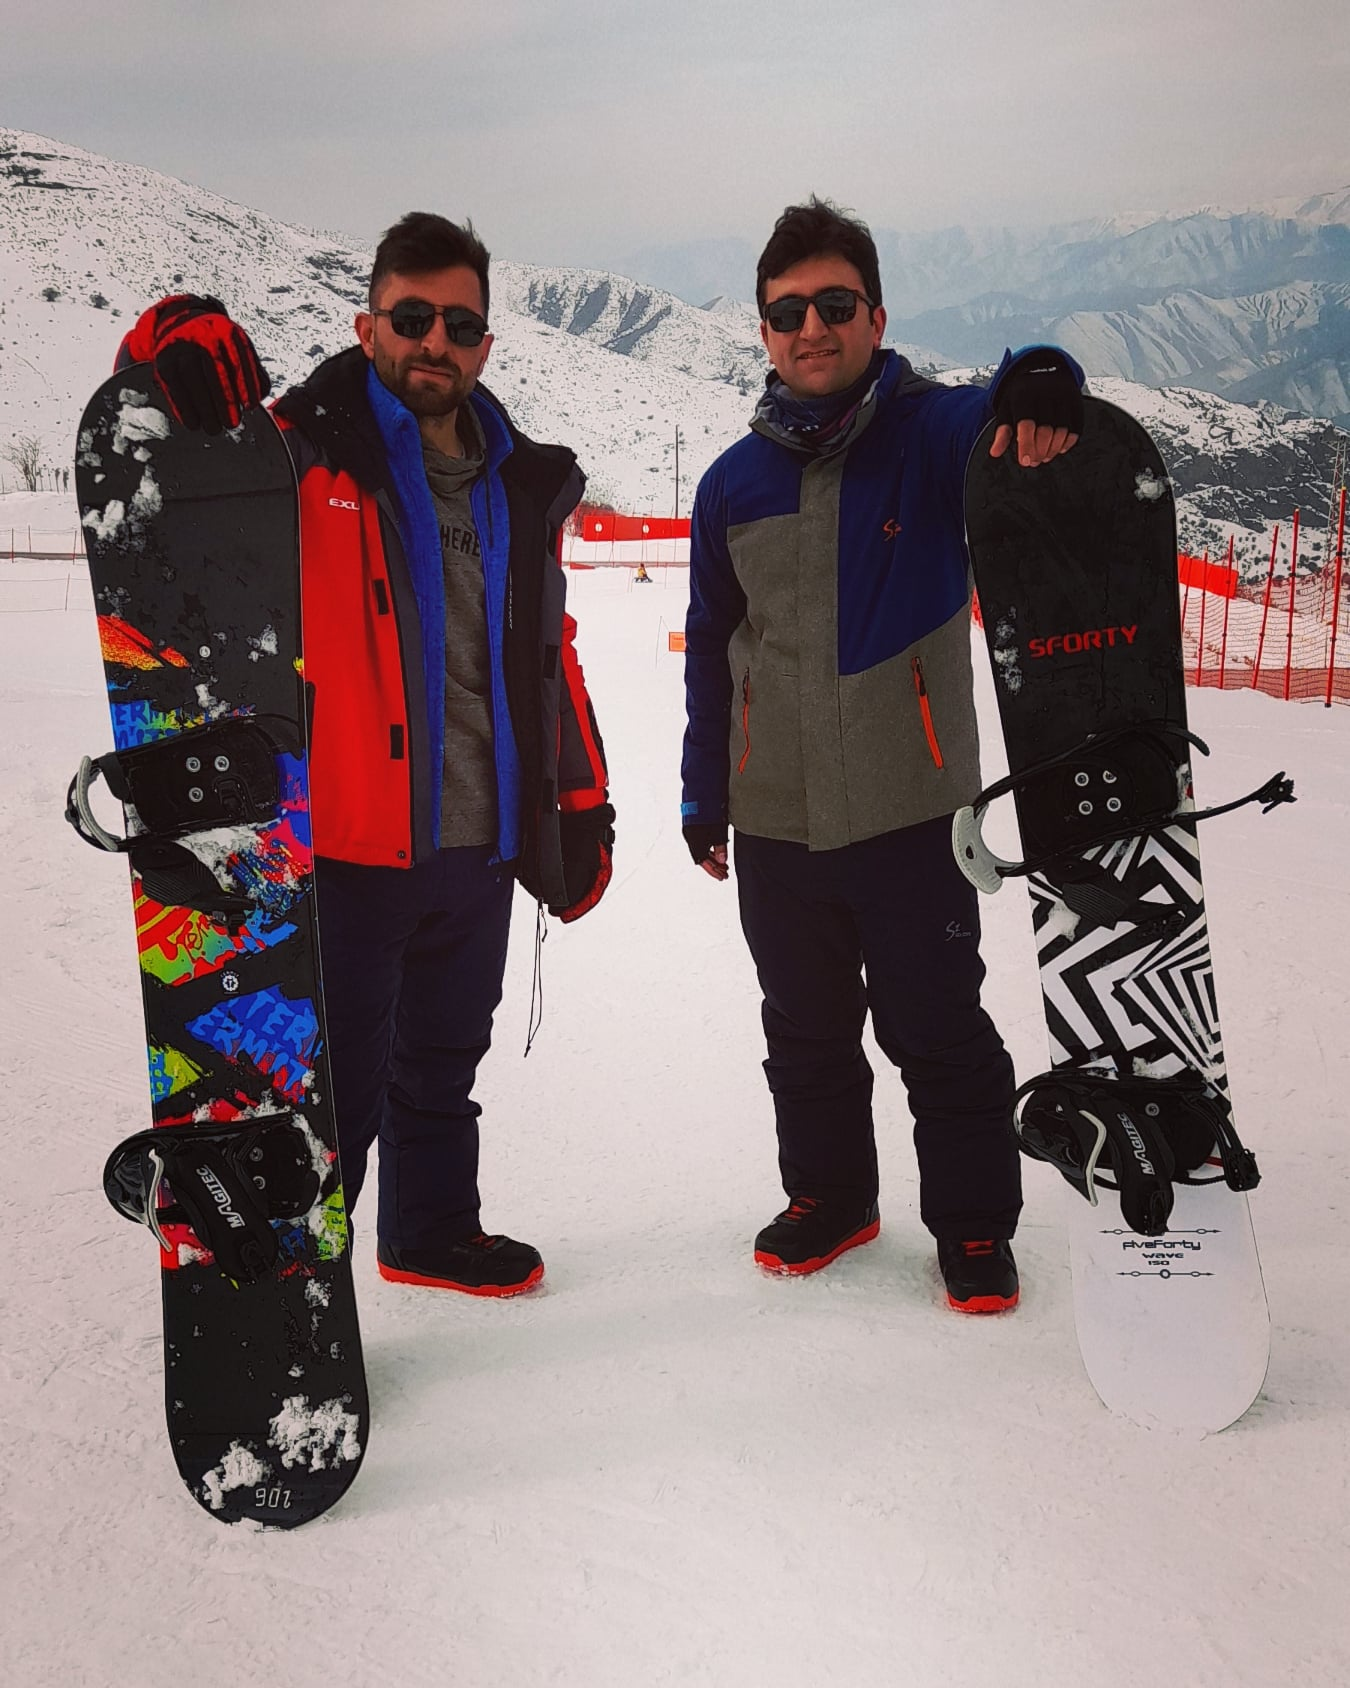 Agbulag Ski Resort